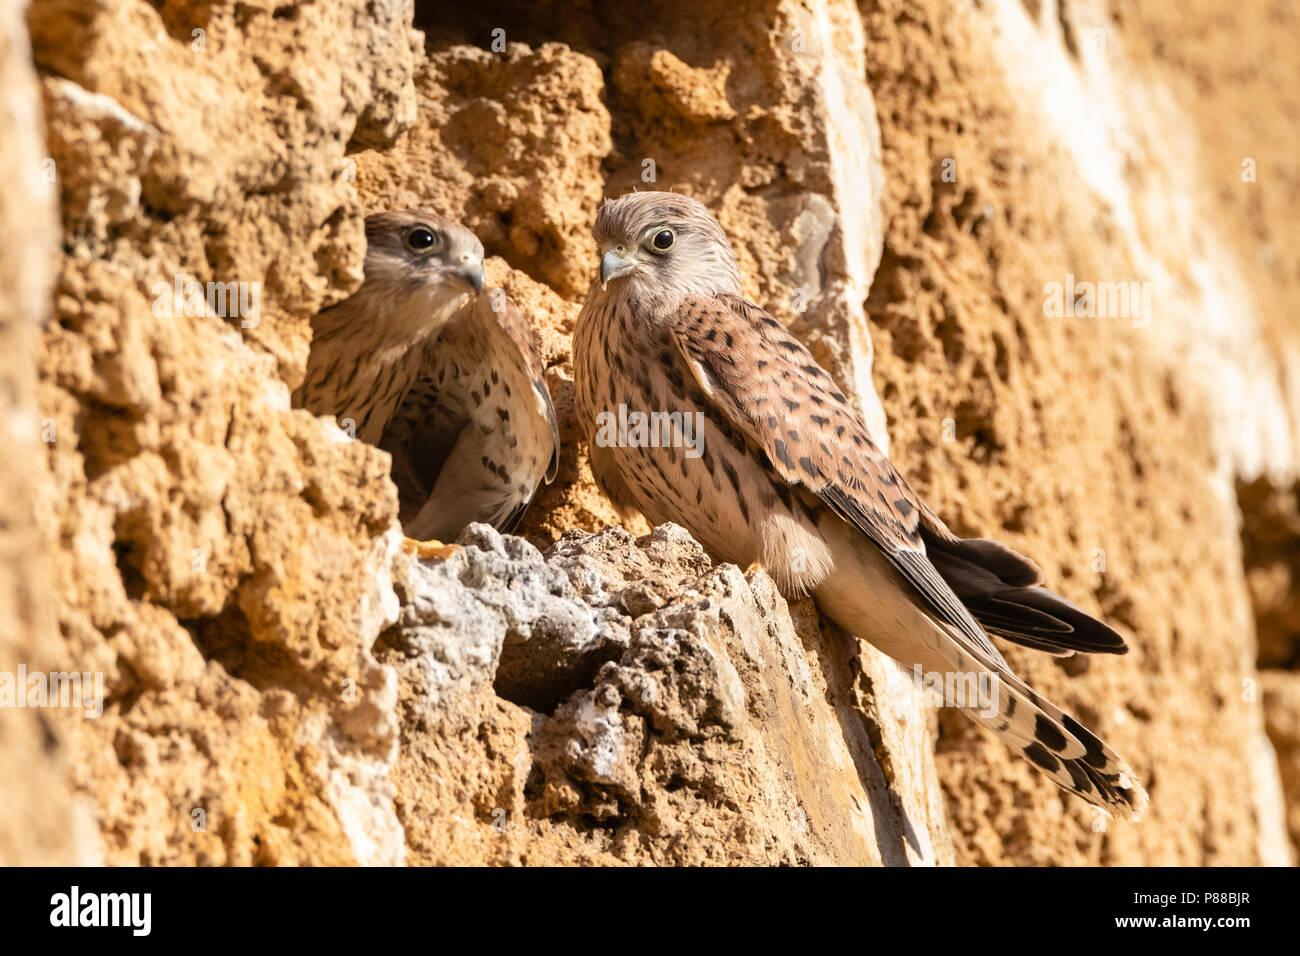 Immature Lesser Kestrel (Falco naumanni) at a breeding colony in Spain. - Stock Image